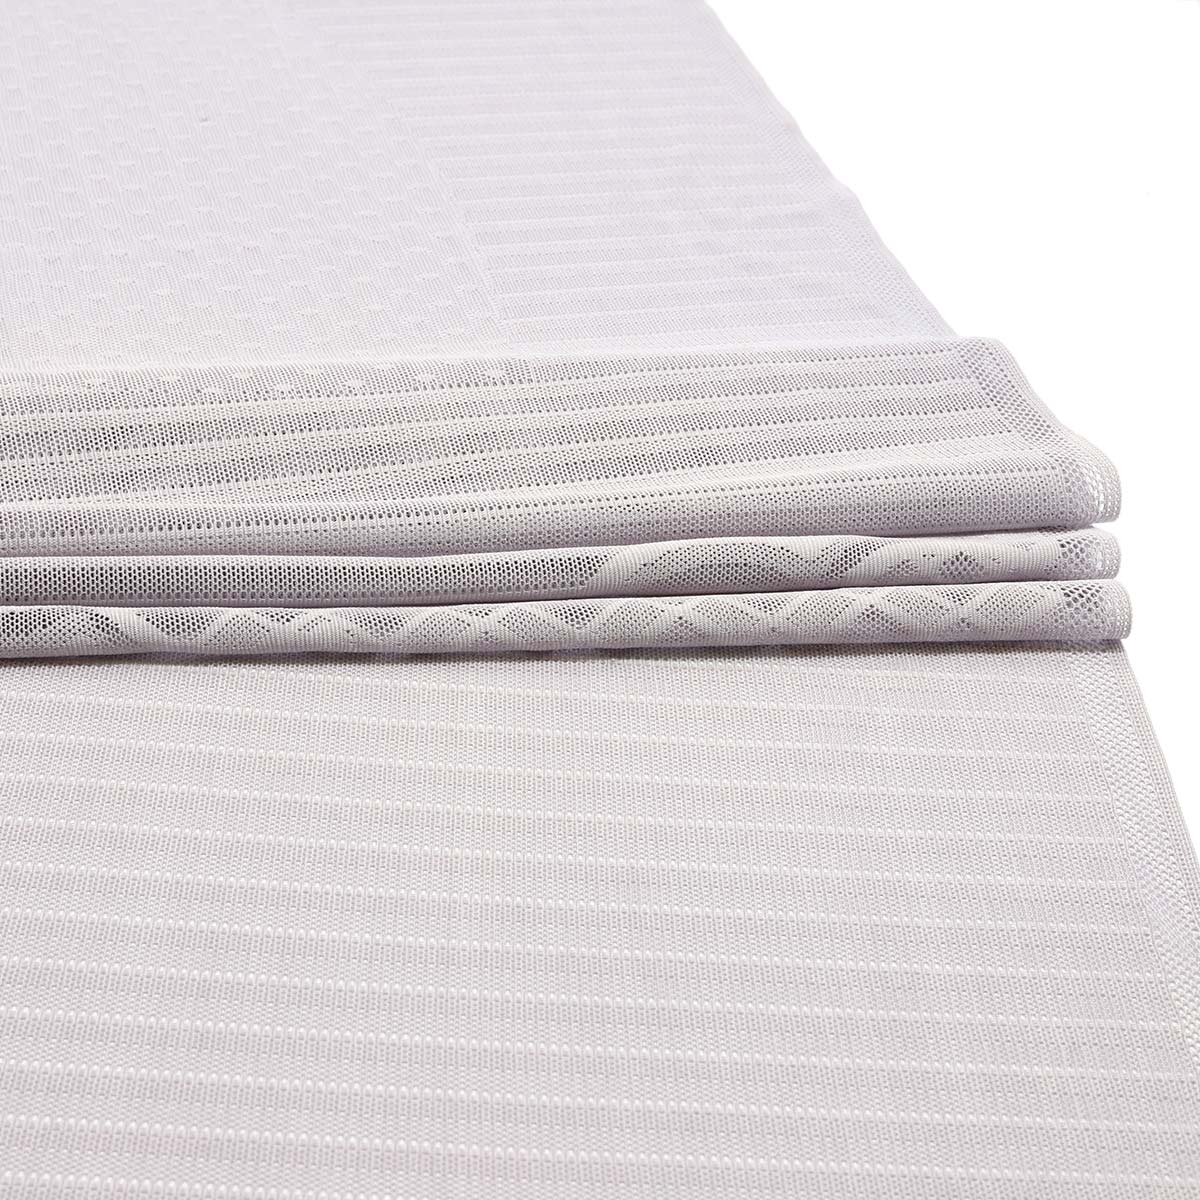 SU 25 Ткань эластичная бельевая 48 см*10